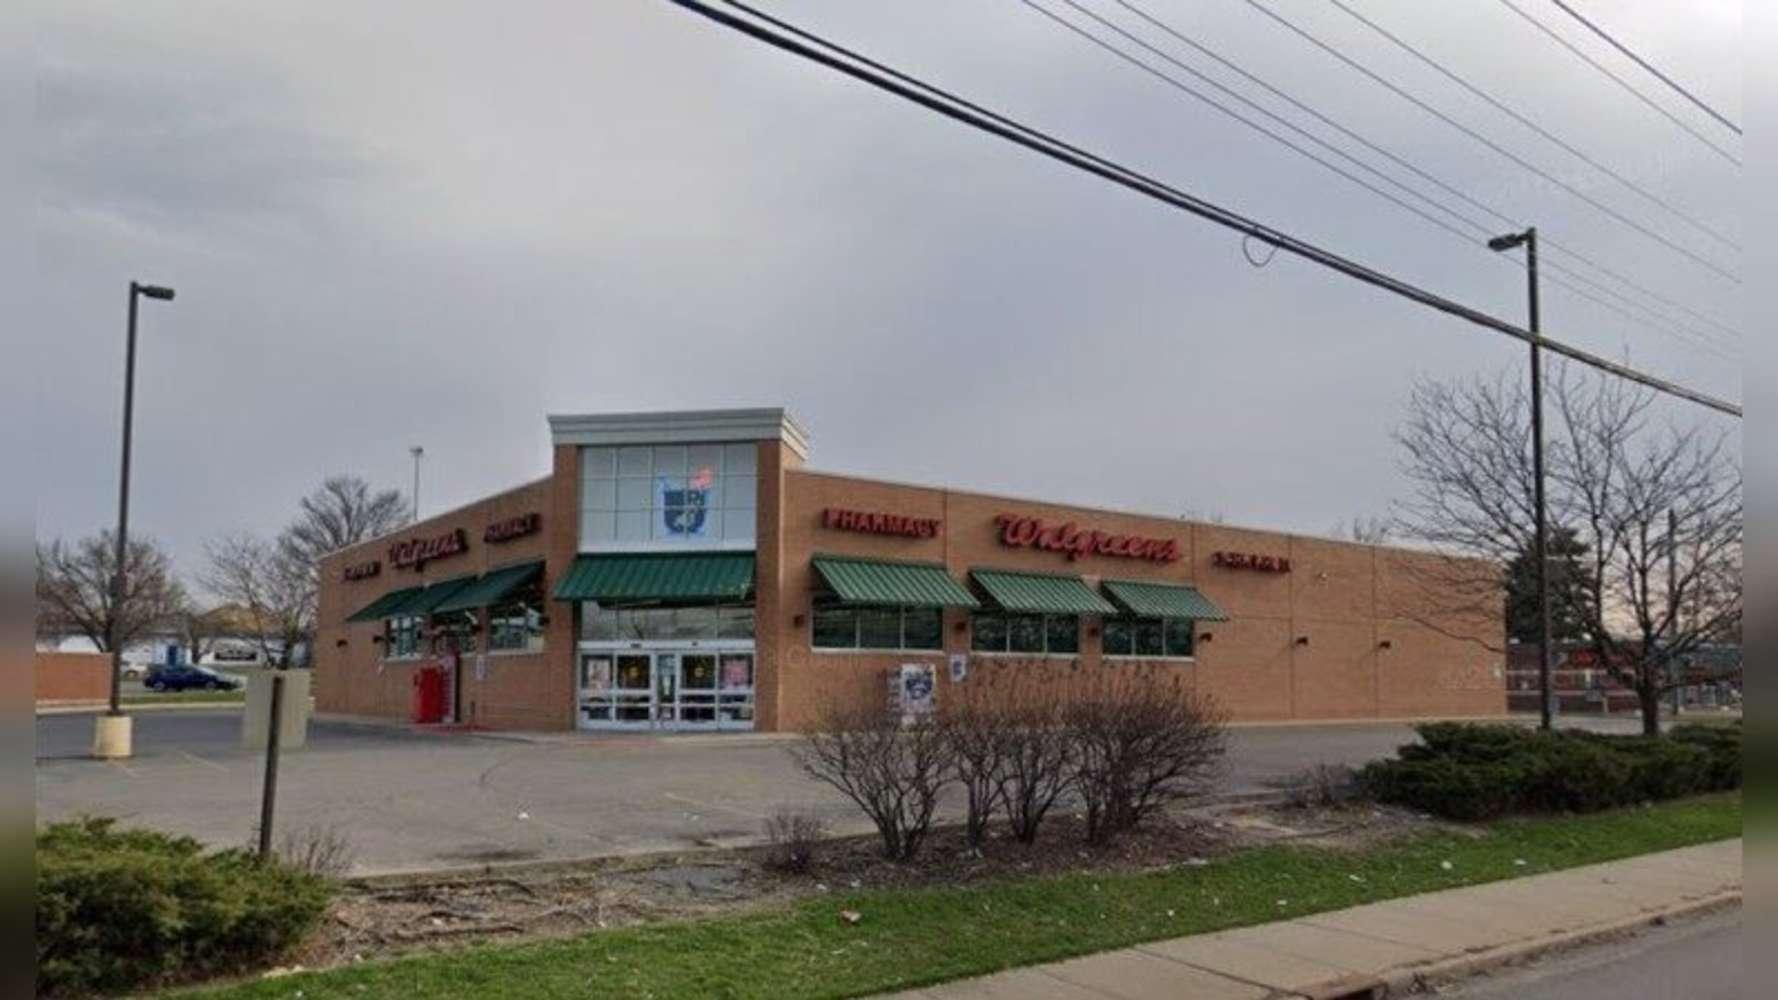 Retail Cincinnati, 45239-4282 - Walgreens 6787 - Galbraith Road - Cincinnati, Oh